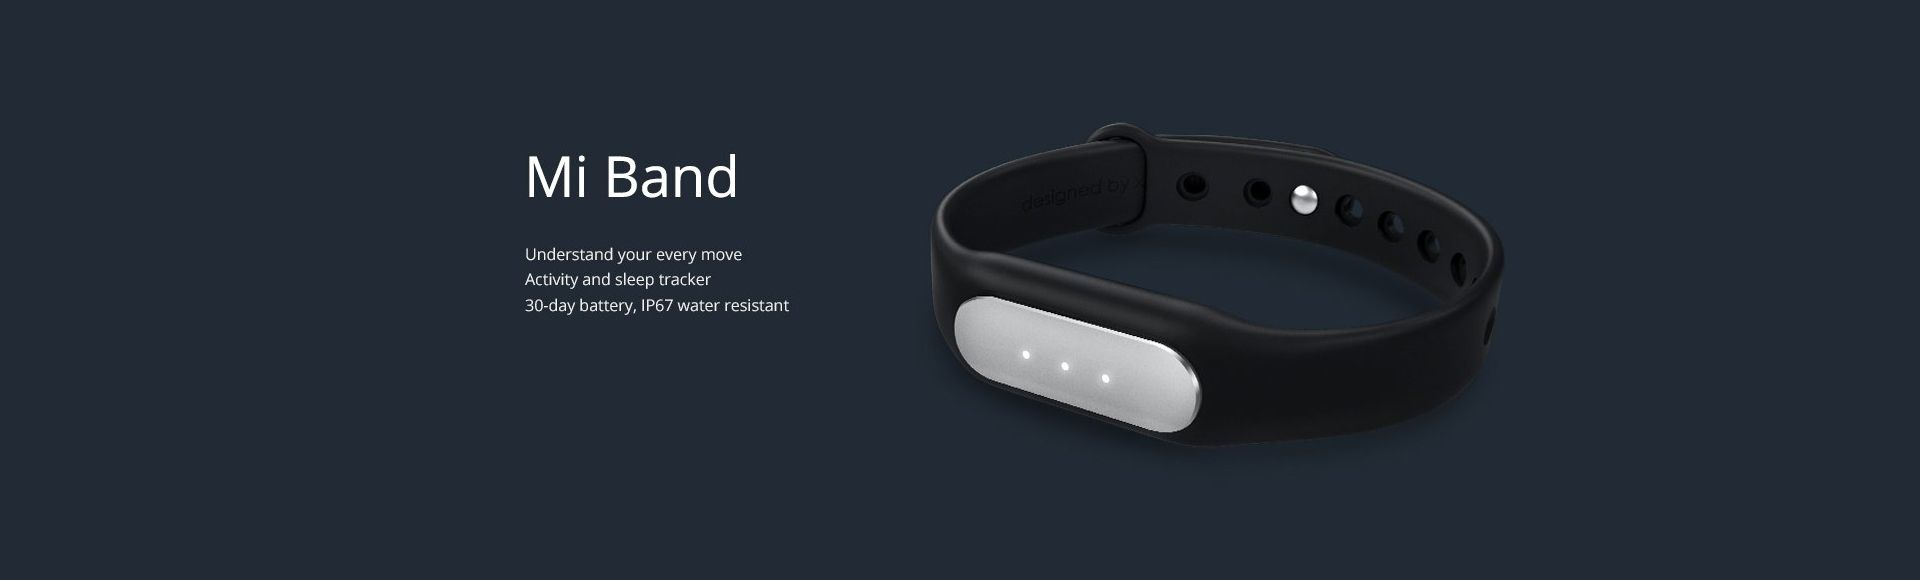 Xiaomi Mi Band 1S - Heart rate pulse sensor Sleep monitor IP 67 waterproof